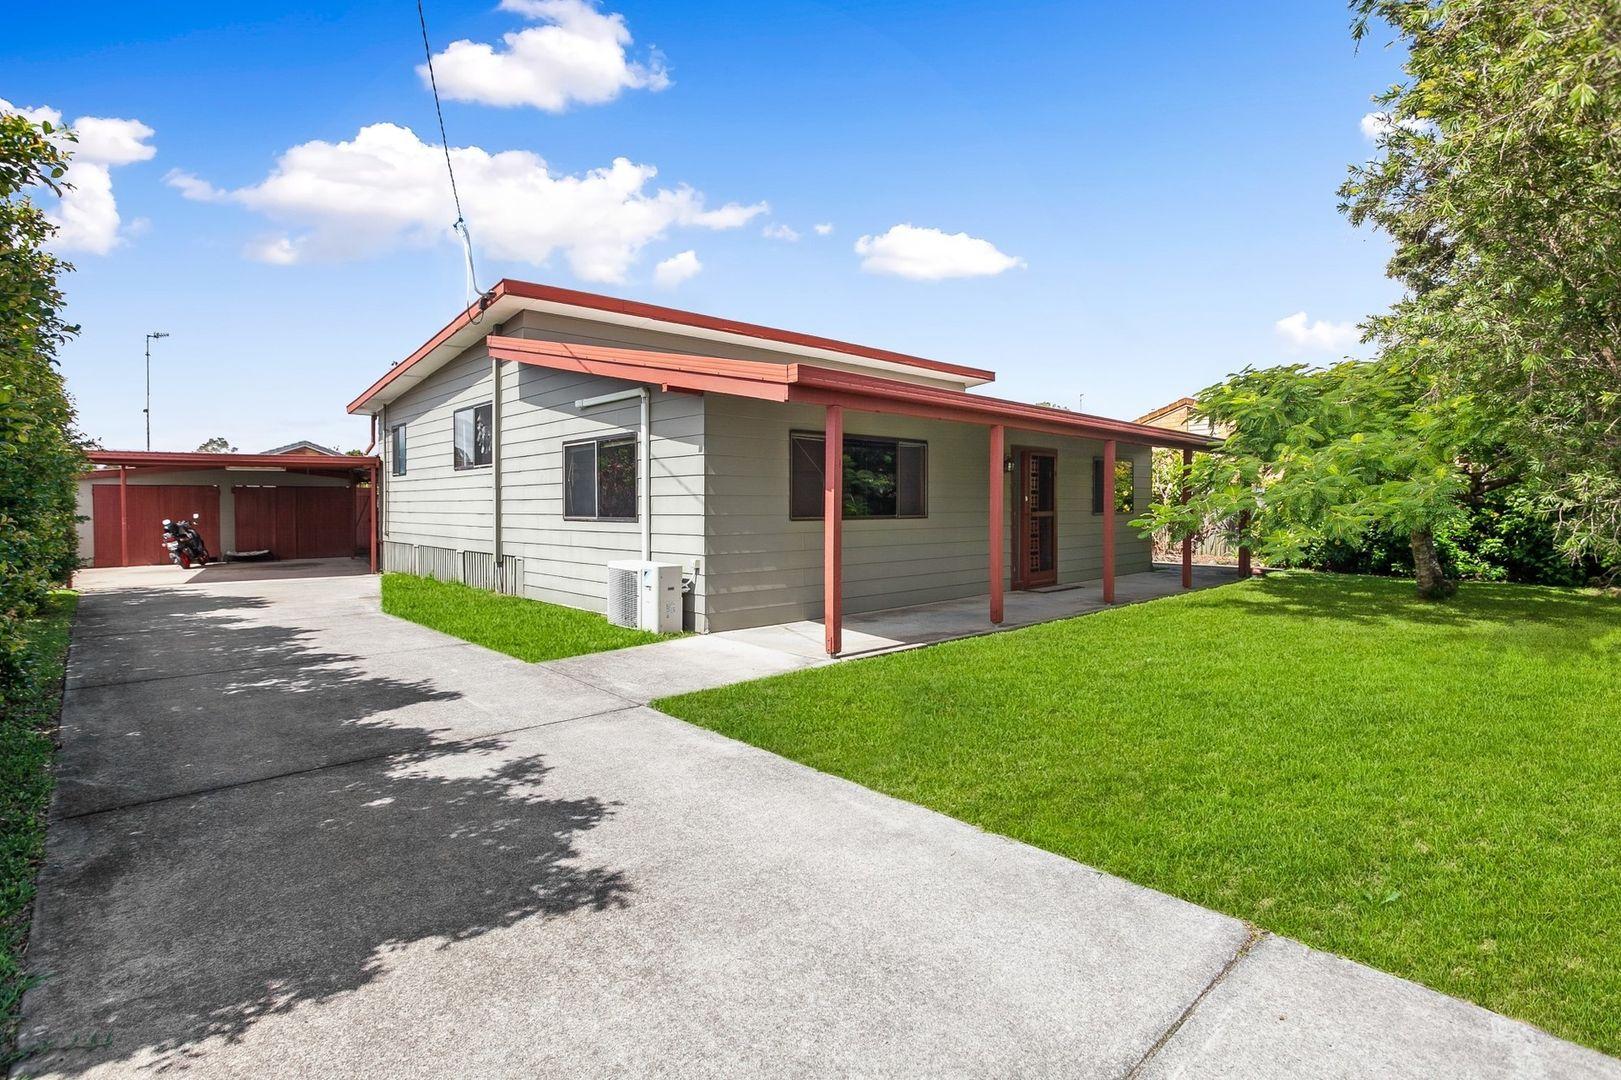 129 Moorindil St, Tewantin QLD 4565, Image 0